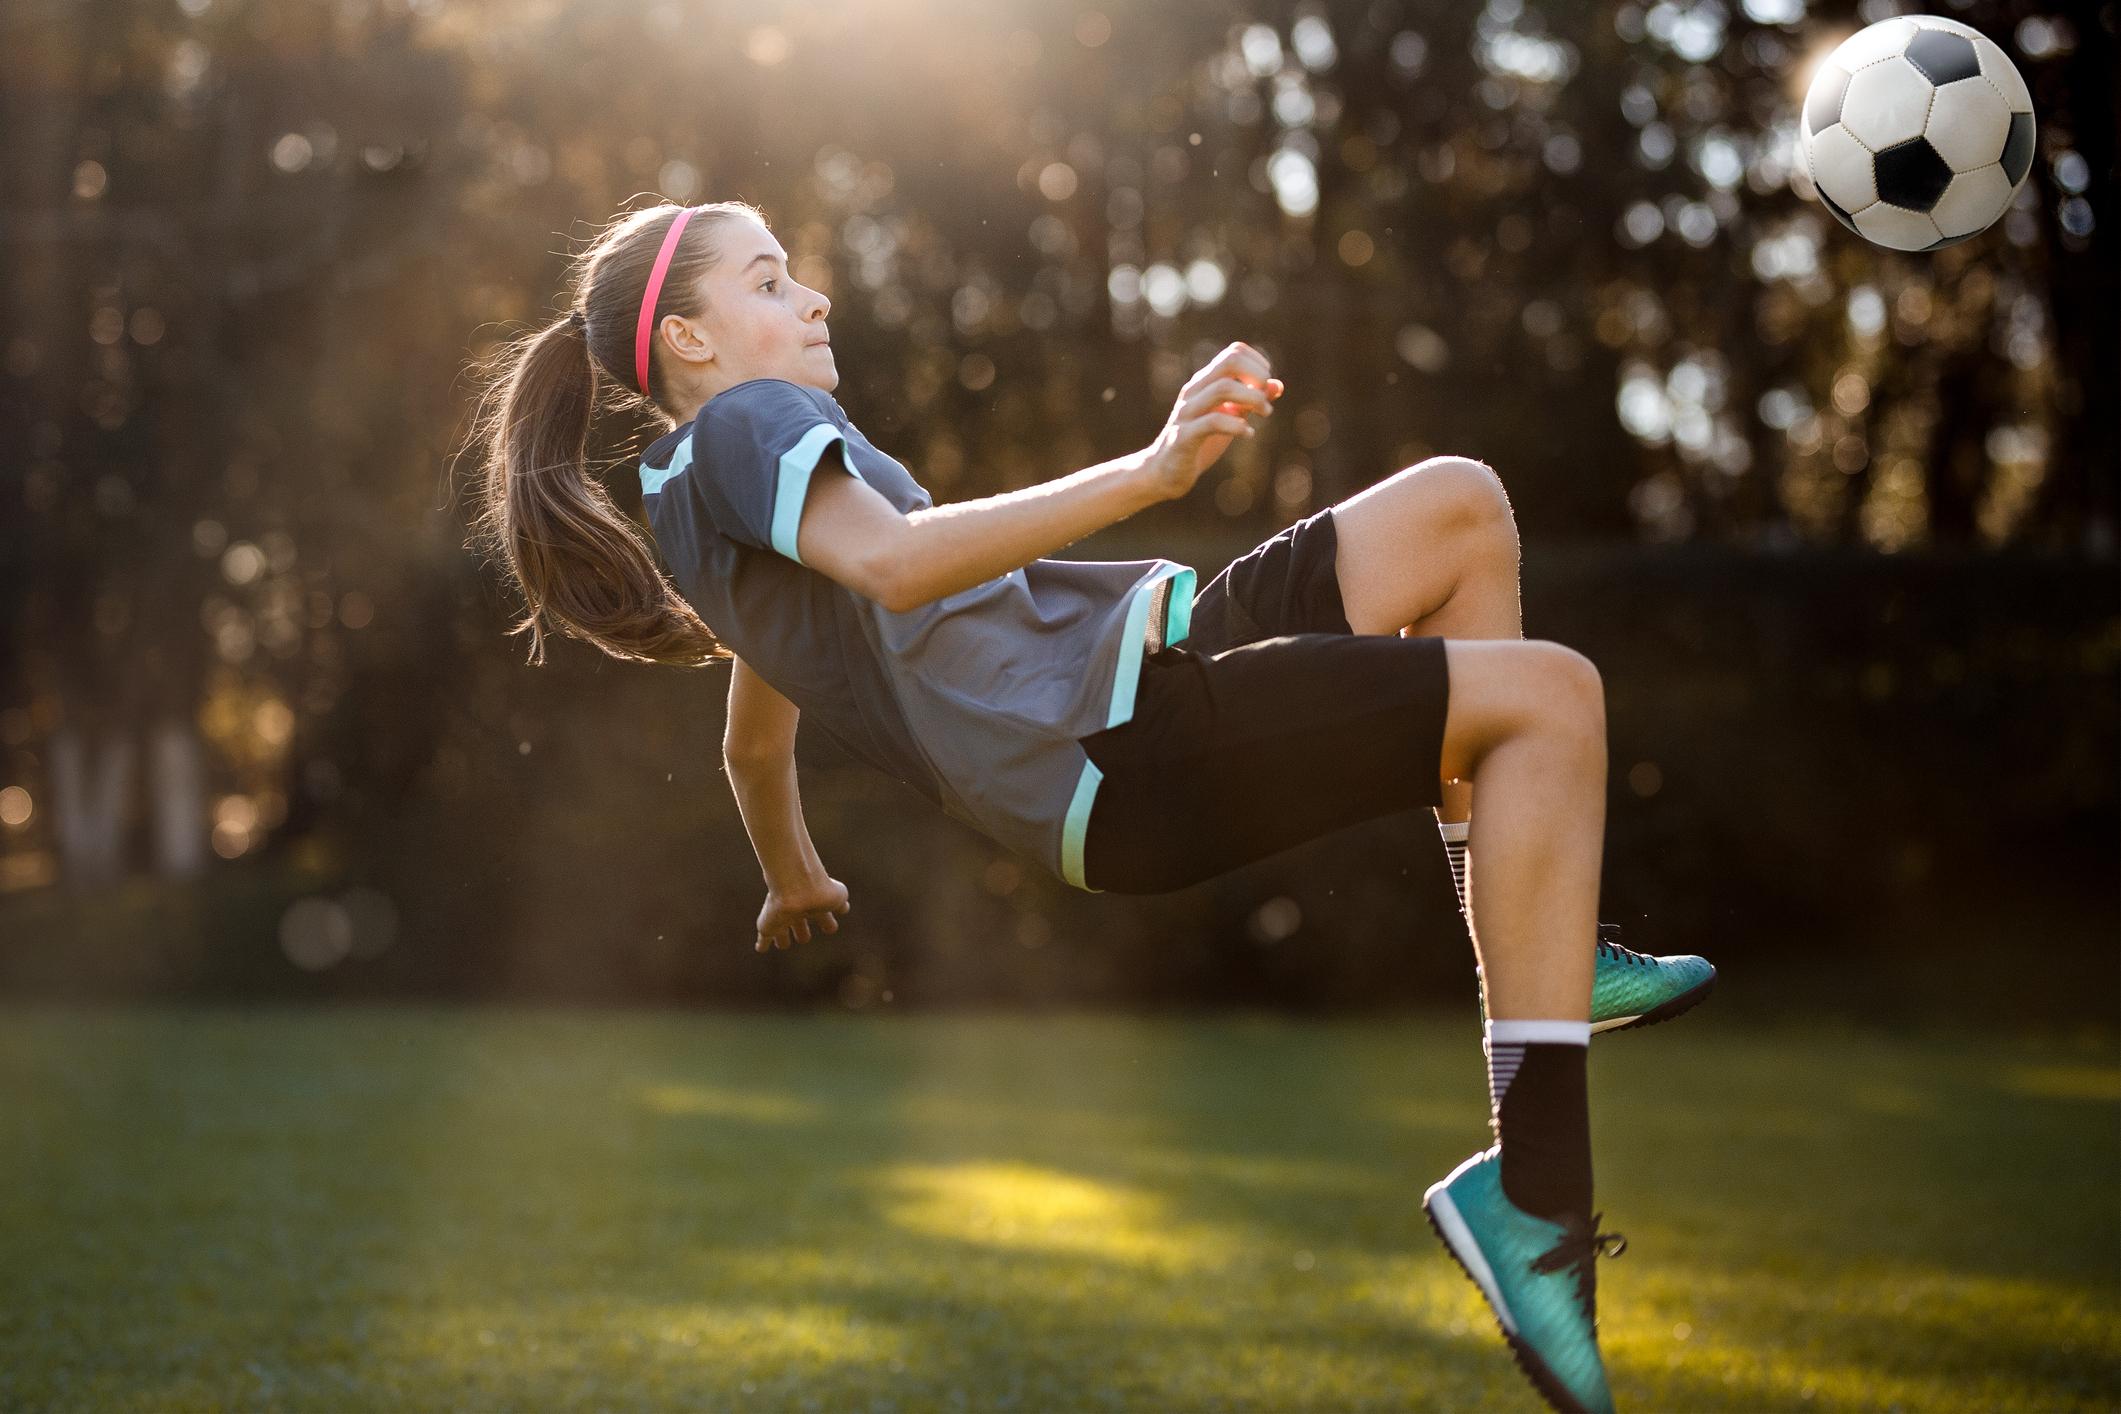 Garota jogando futebol